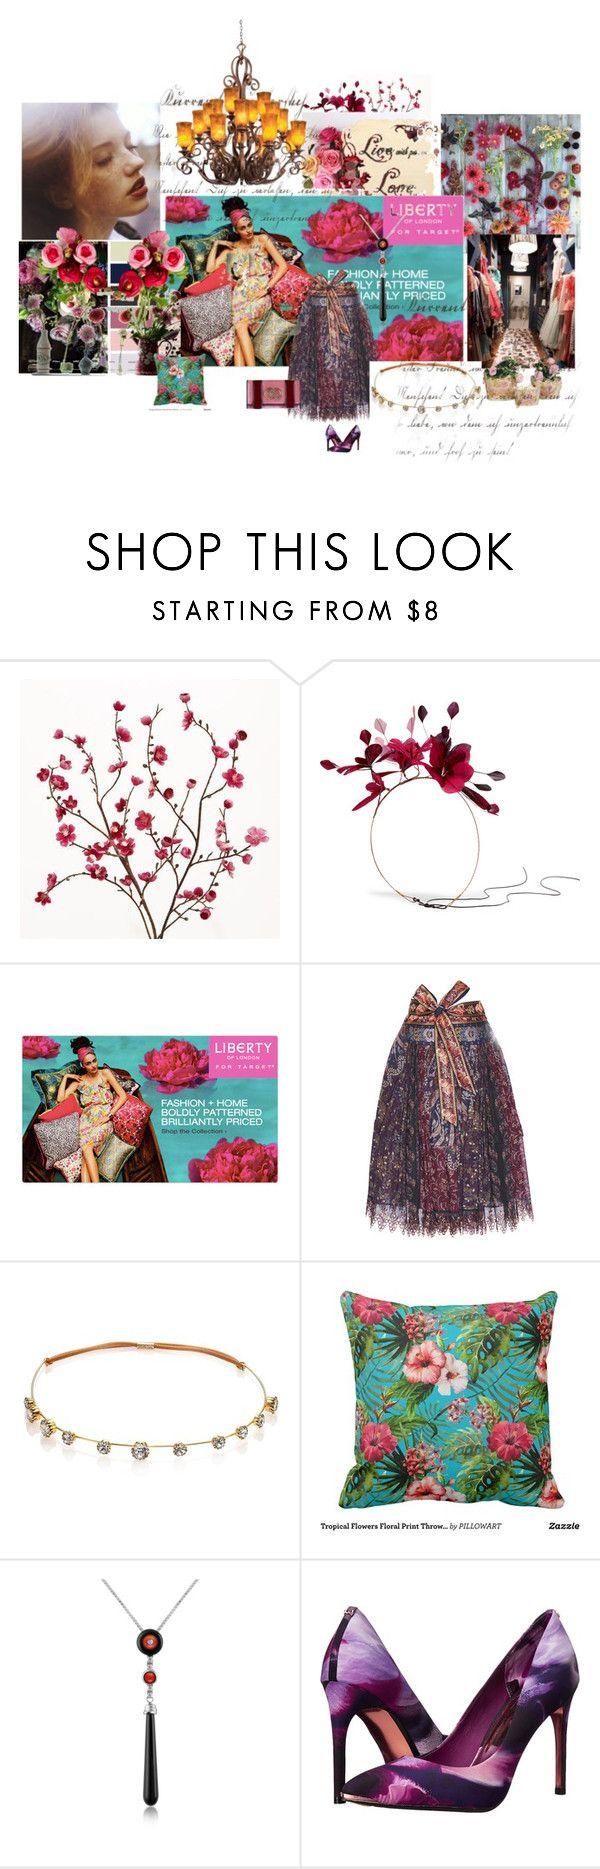 """Comienzo de año..."" by maryrosa on Polyvore featuring moda, Cost Plus World Market, Valentino, Etro, Jennifer Behr, Del Gatto, Ted Baker, Dsquared2 y Kalco"